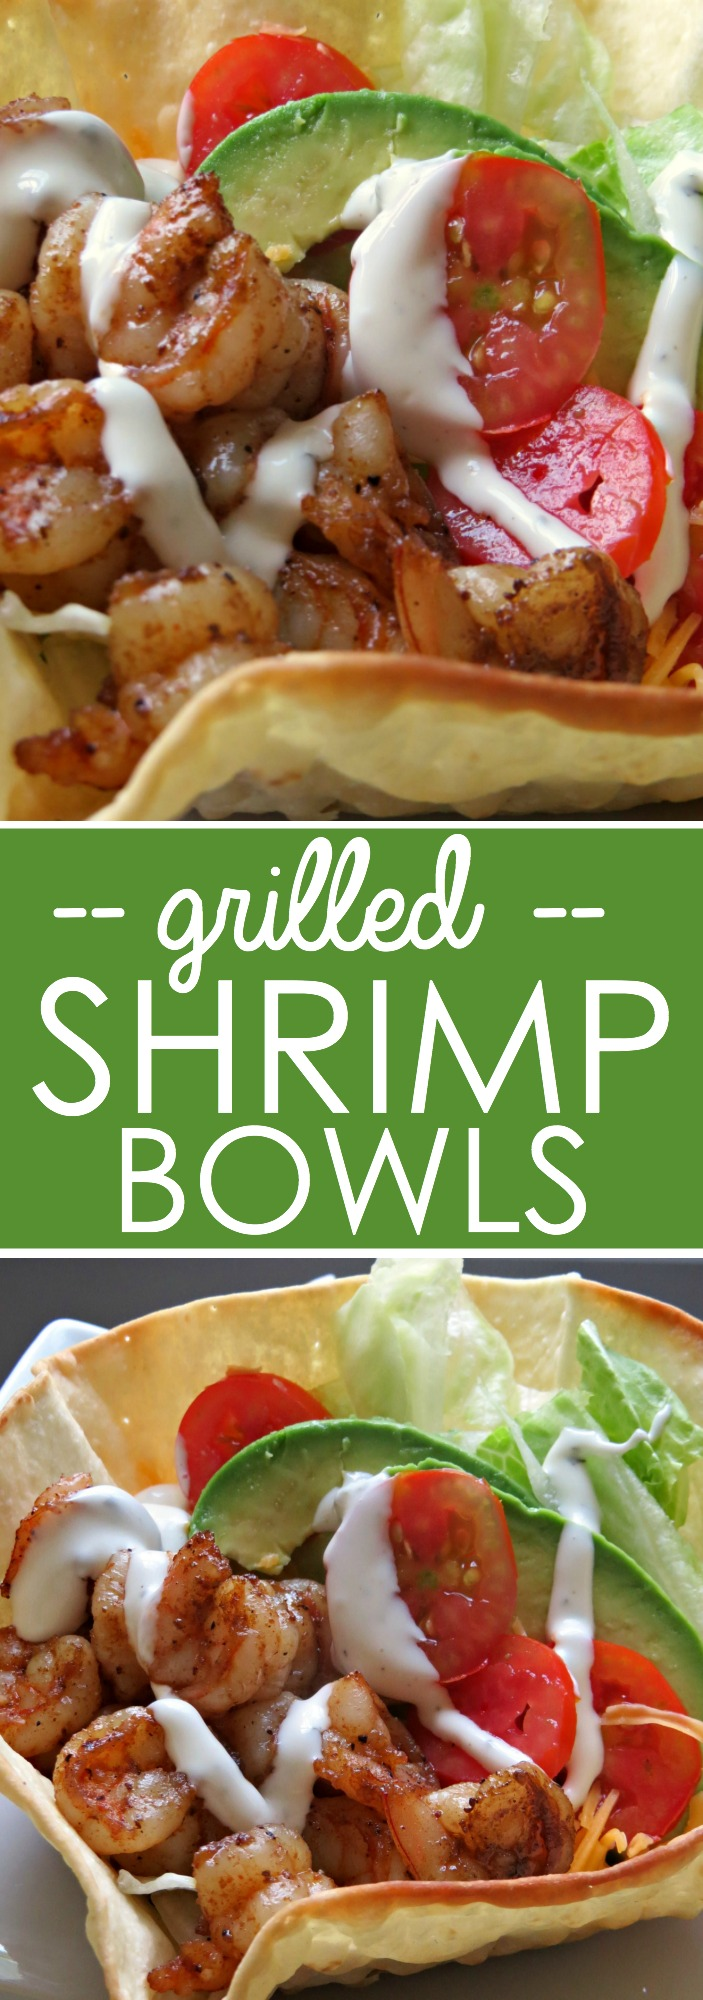 grilled shrimp recipes